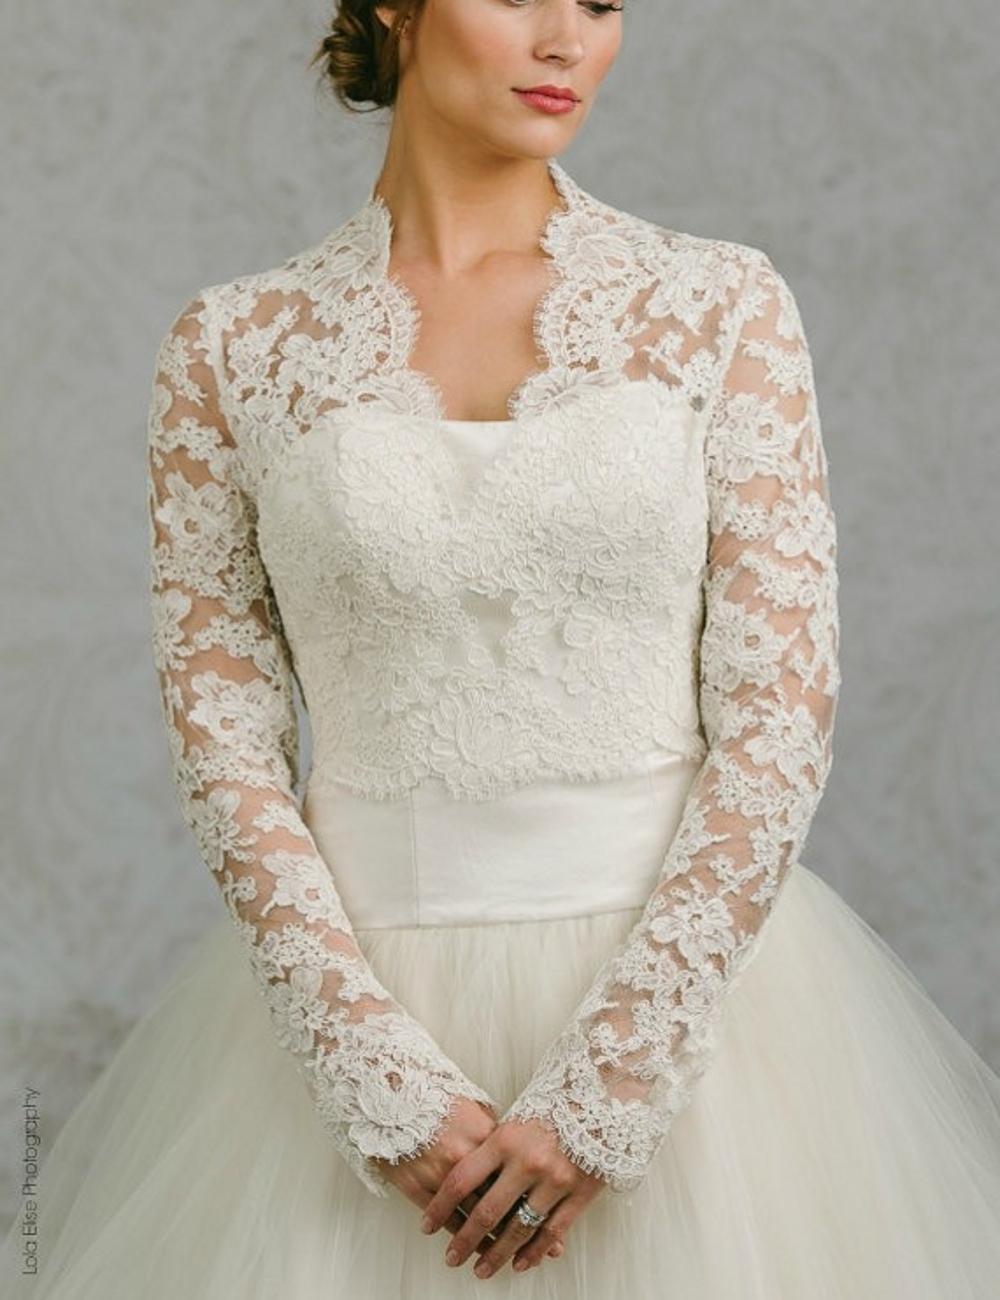 wholesale bolero jackets for wedding dresses wedding dresses in jax. Black Bedroom Furniture Sets. Home Design Ideas